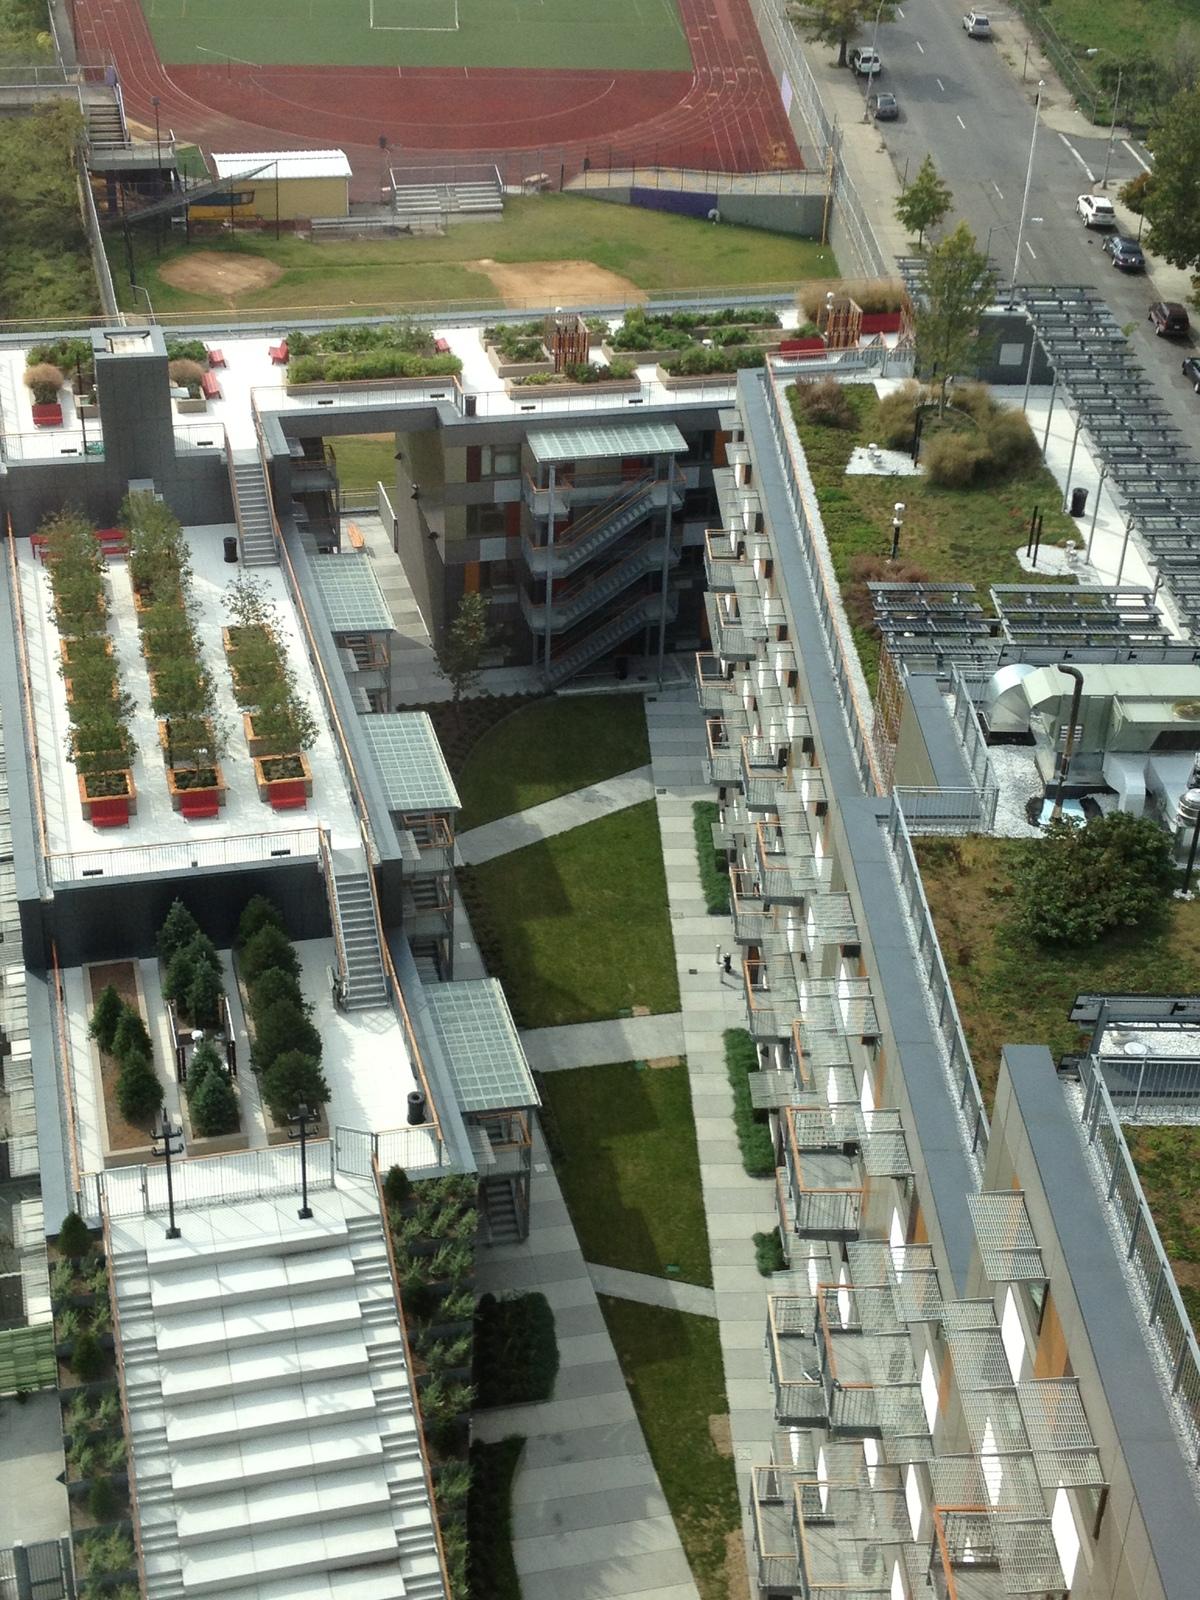 Via Verde - collaboration with Jonathon Rose Companies & Phipps Houses